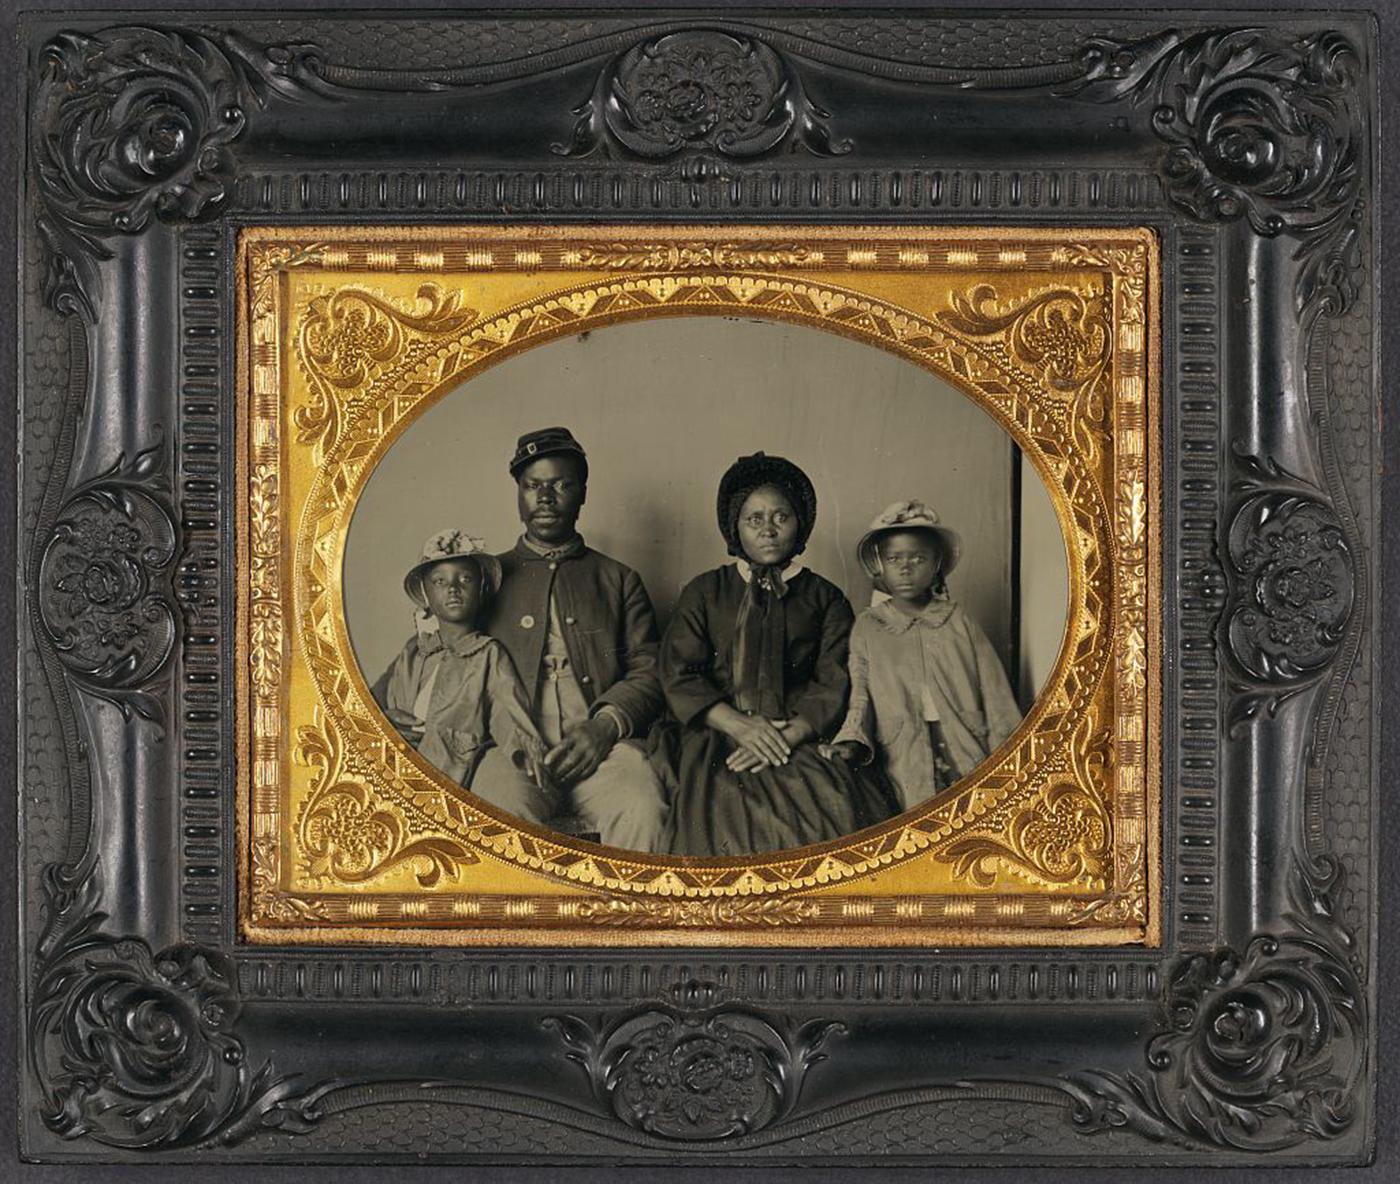 14  The Civil War | THE AMERICAN YAWP